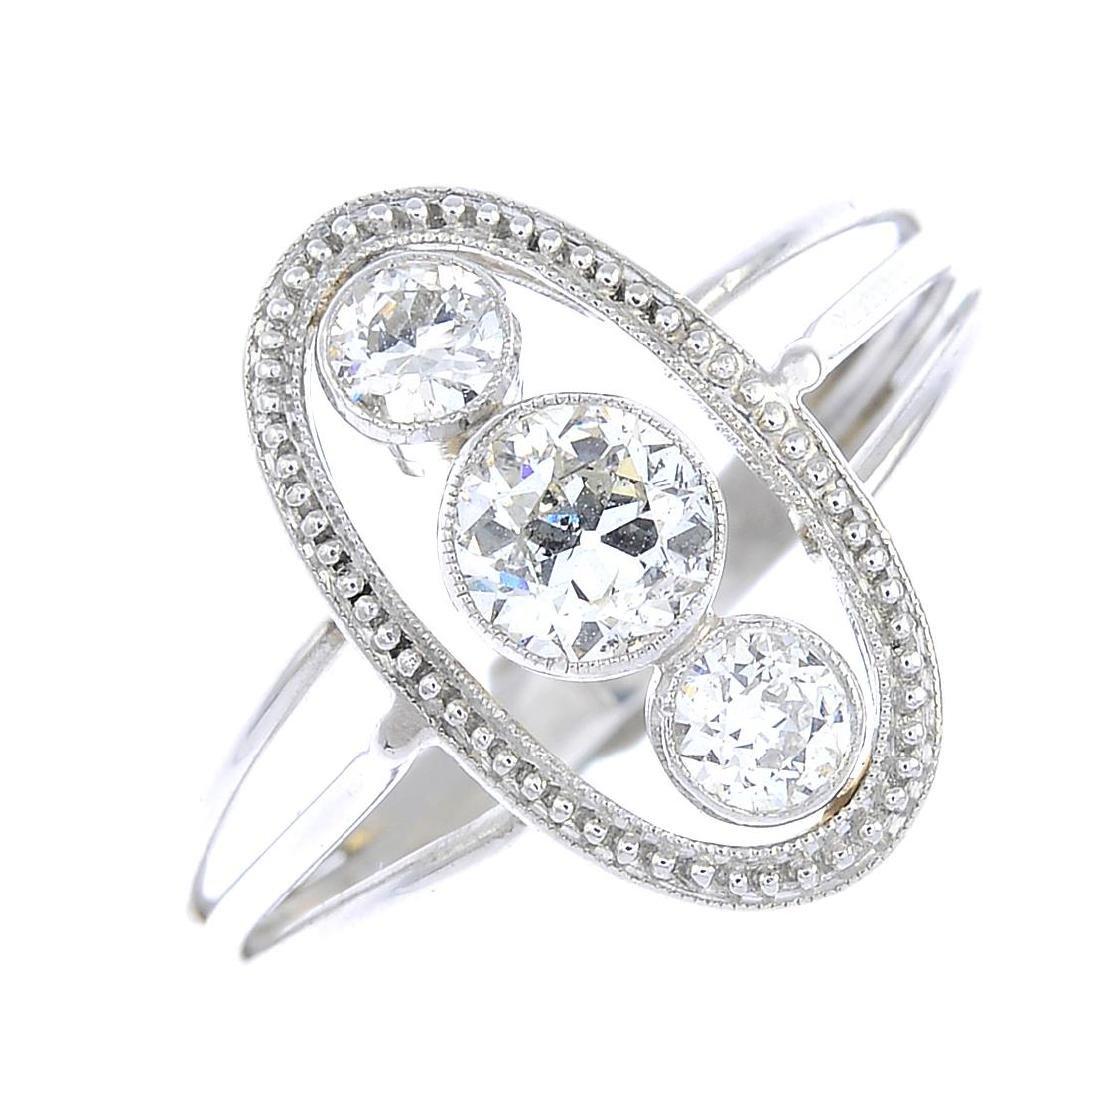 A diamond dress ring. Of openwork design, the graduated